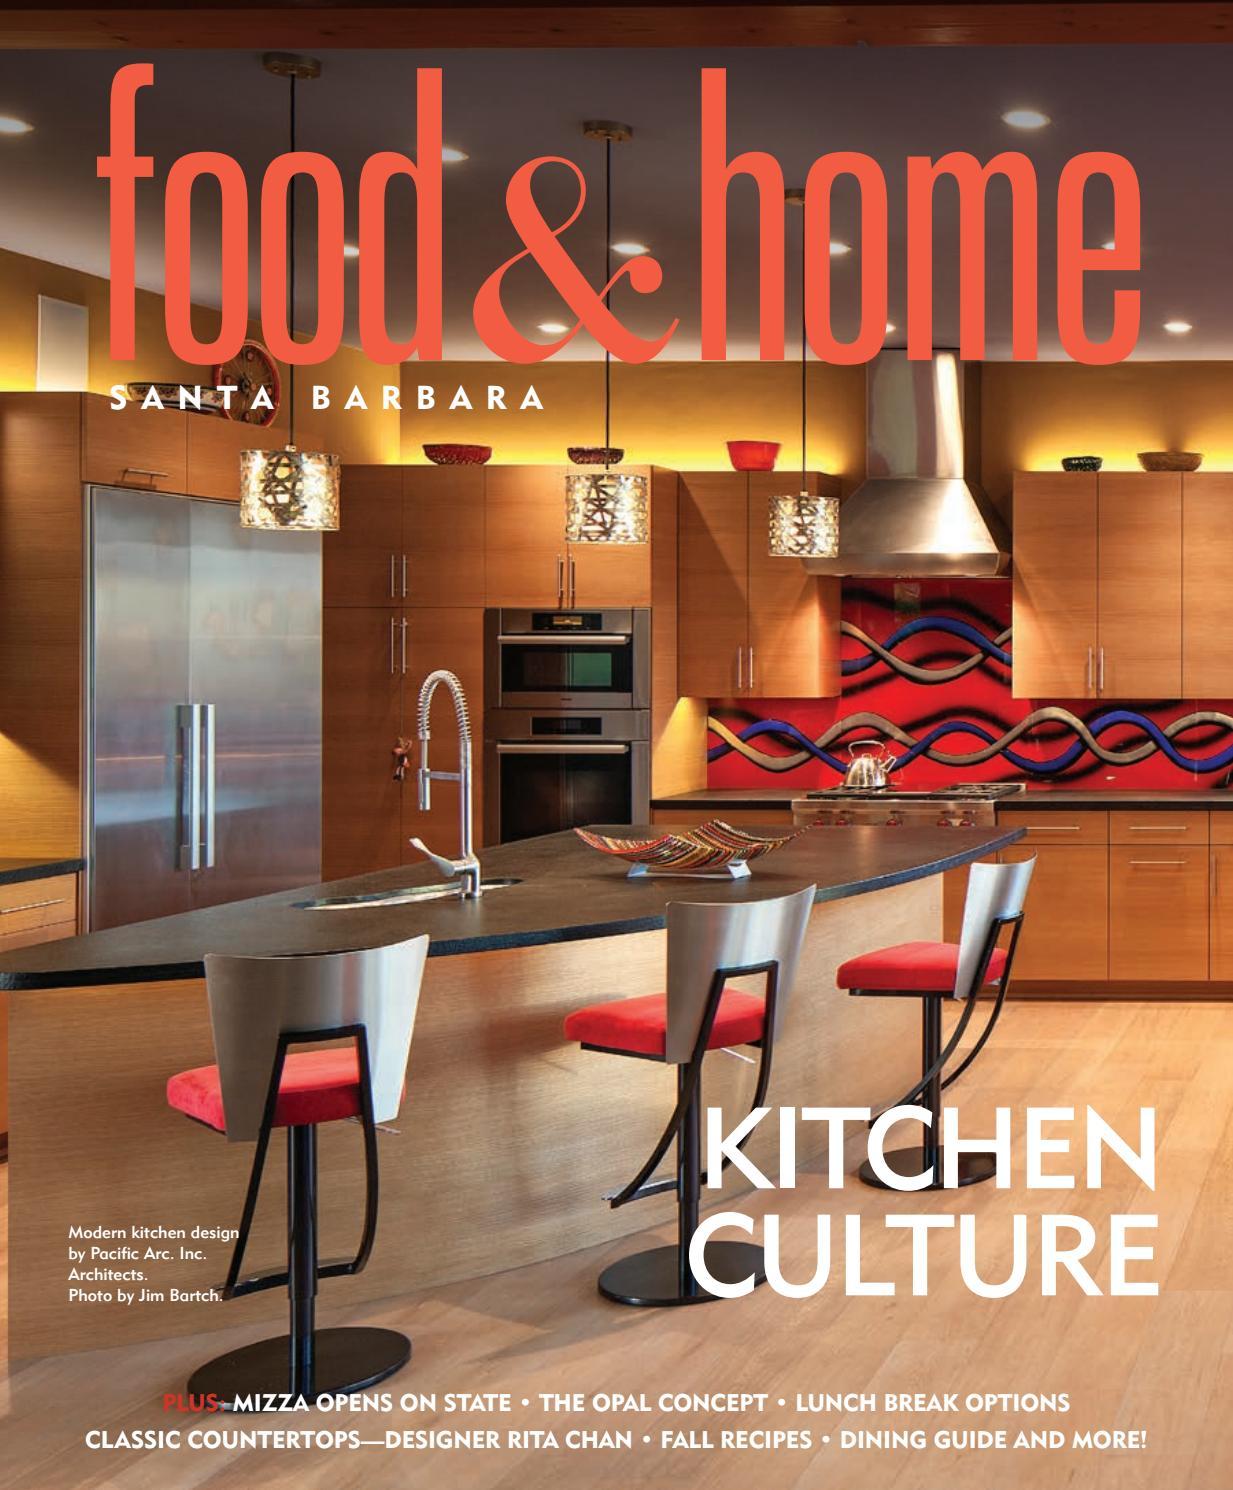 Food & Home - Fall 2018 by City Creative Group - issuu